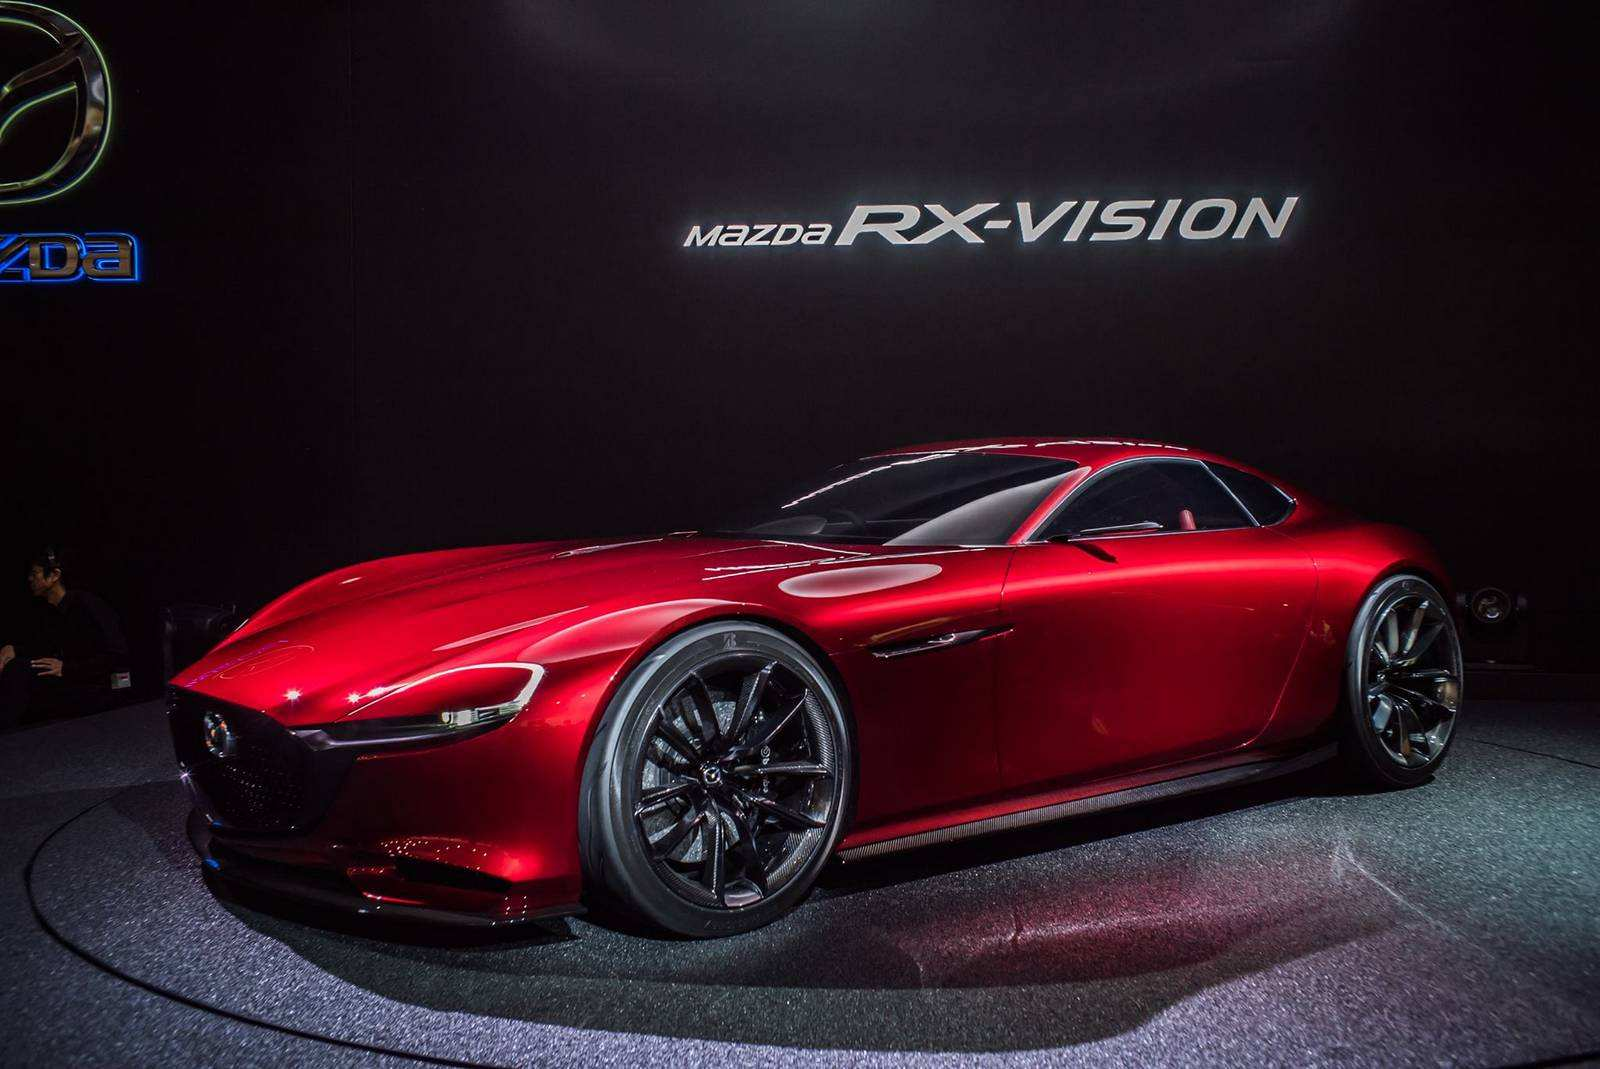 86 Gallery of Mazda Rotary 2020 Model with Mazda Rotary 2020